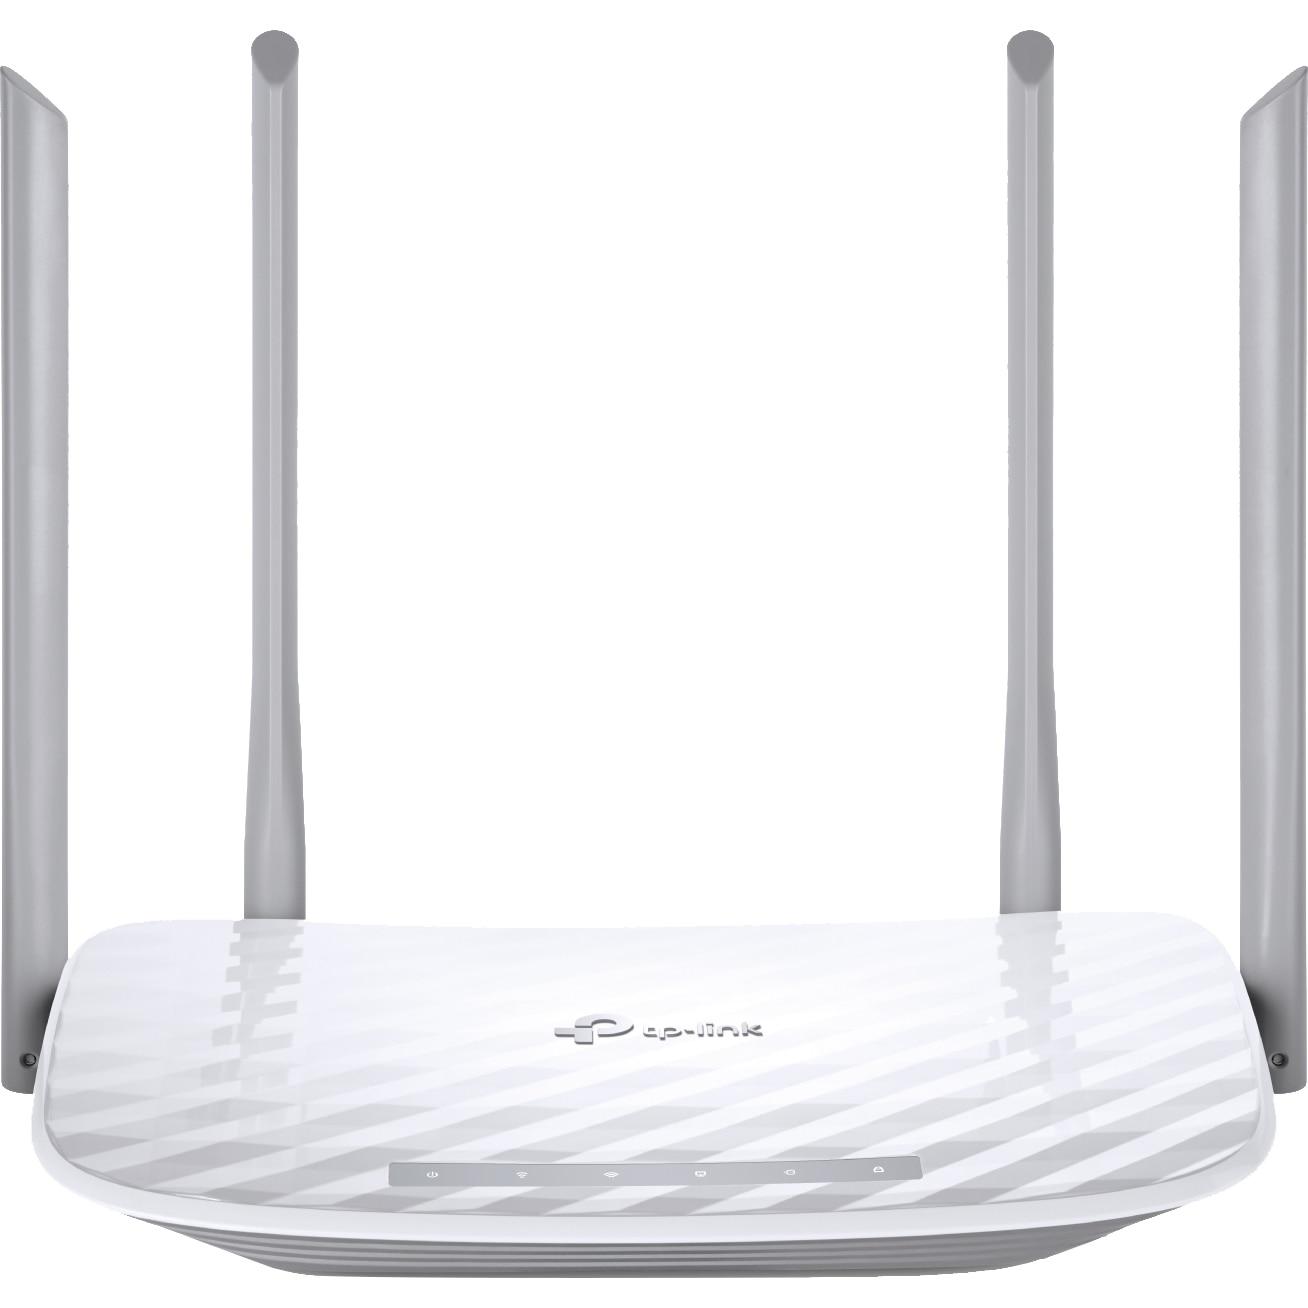 Fotografie Router wireless AC1200 TP-Link Archer C50, Dual Band